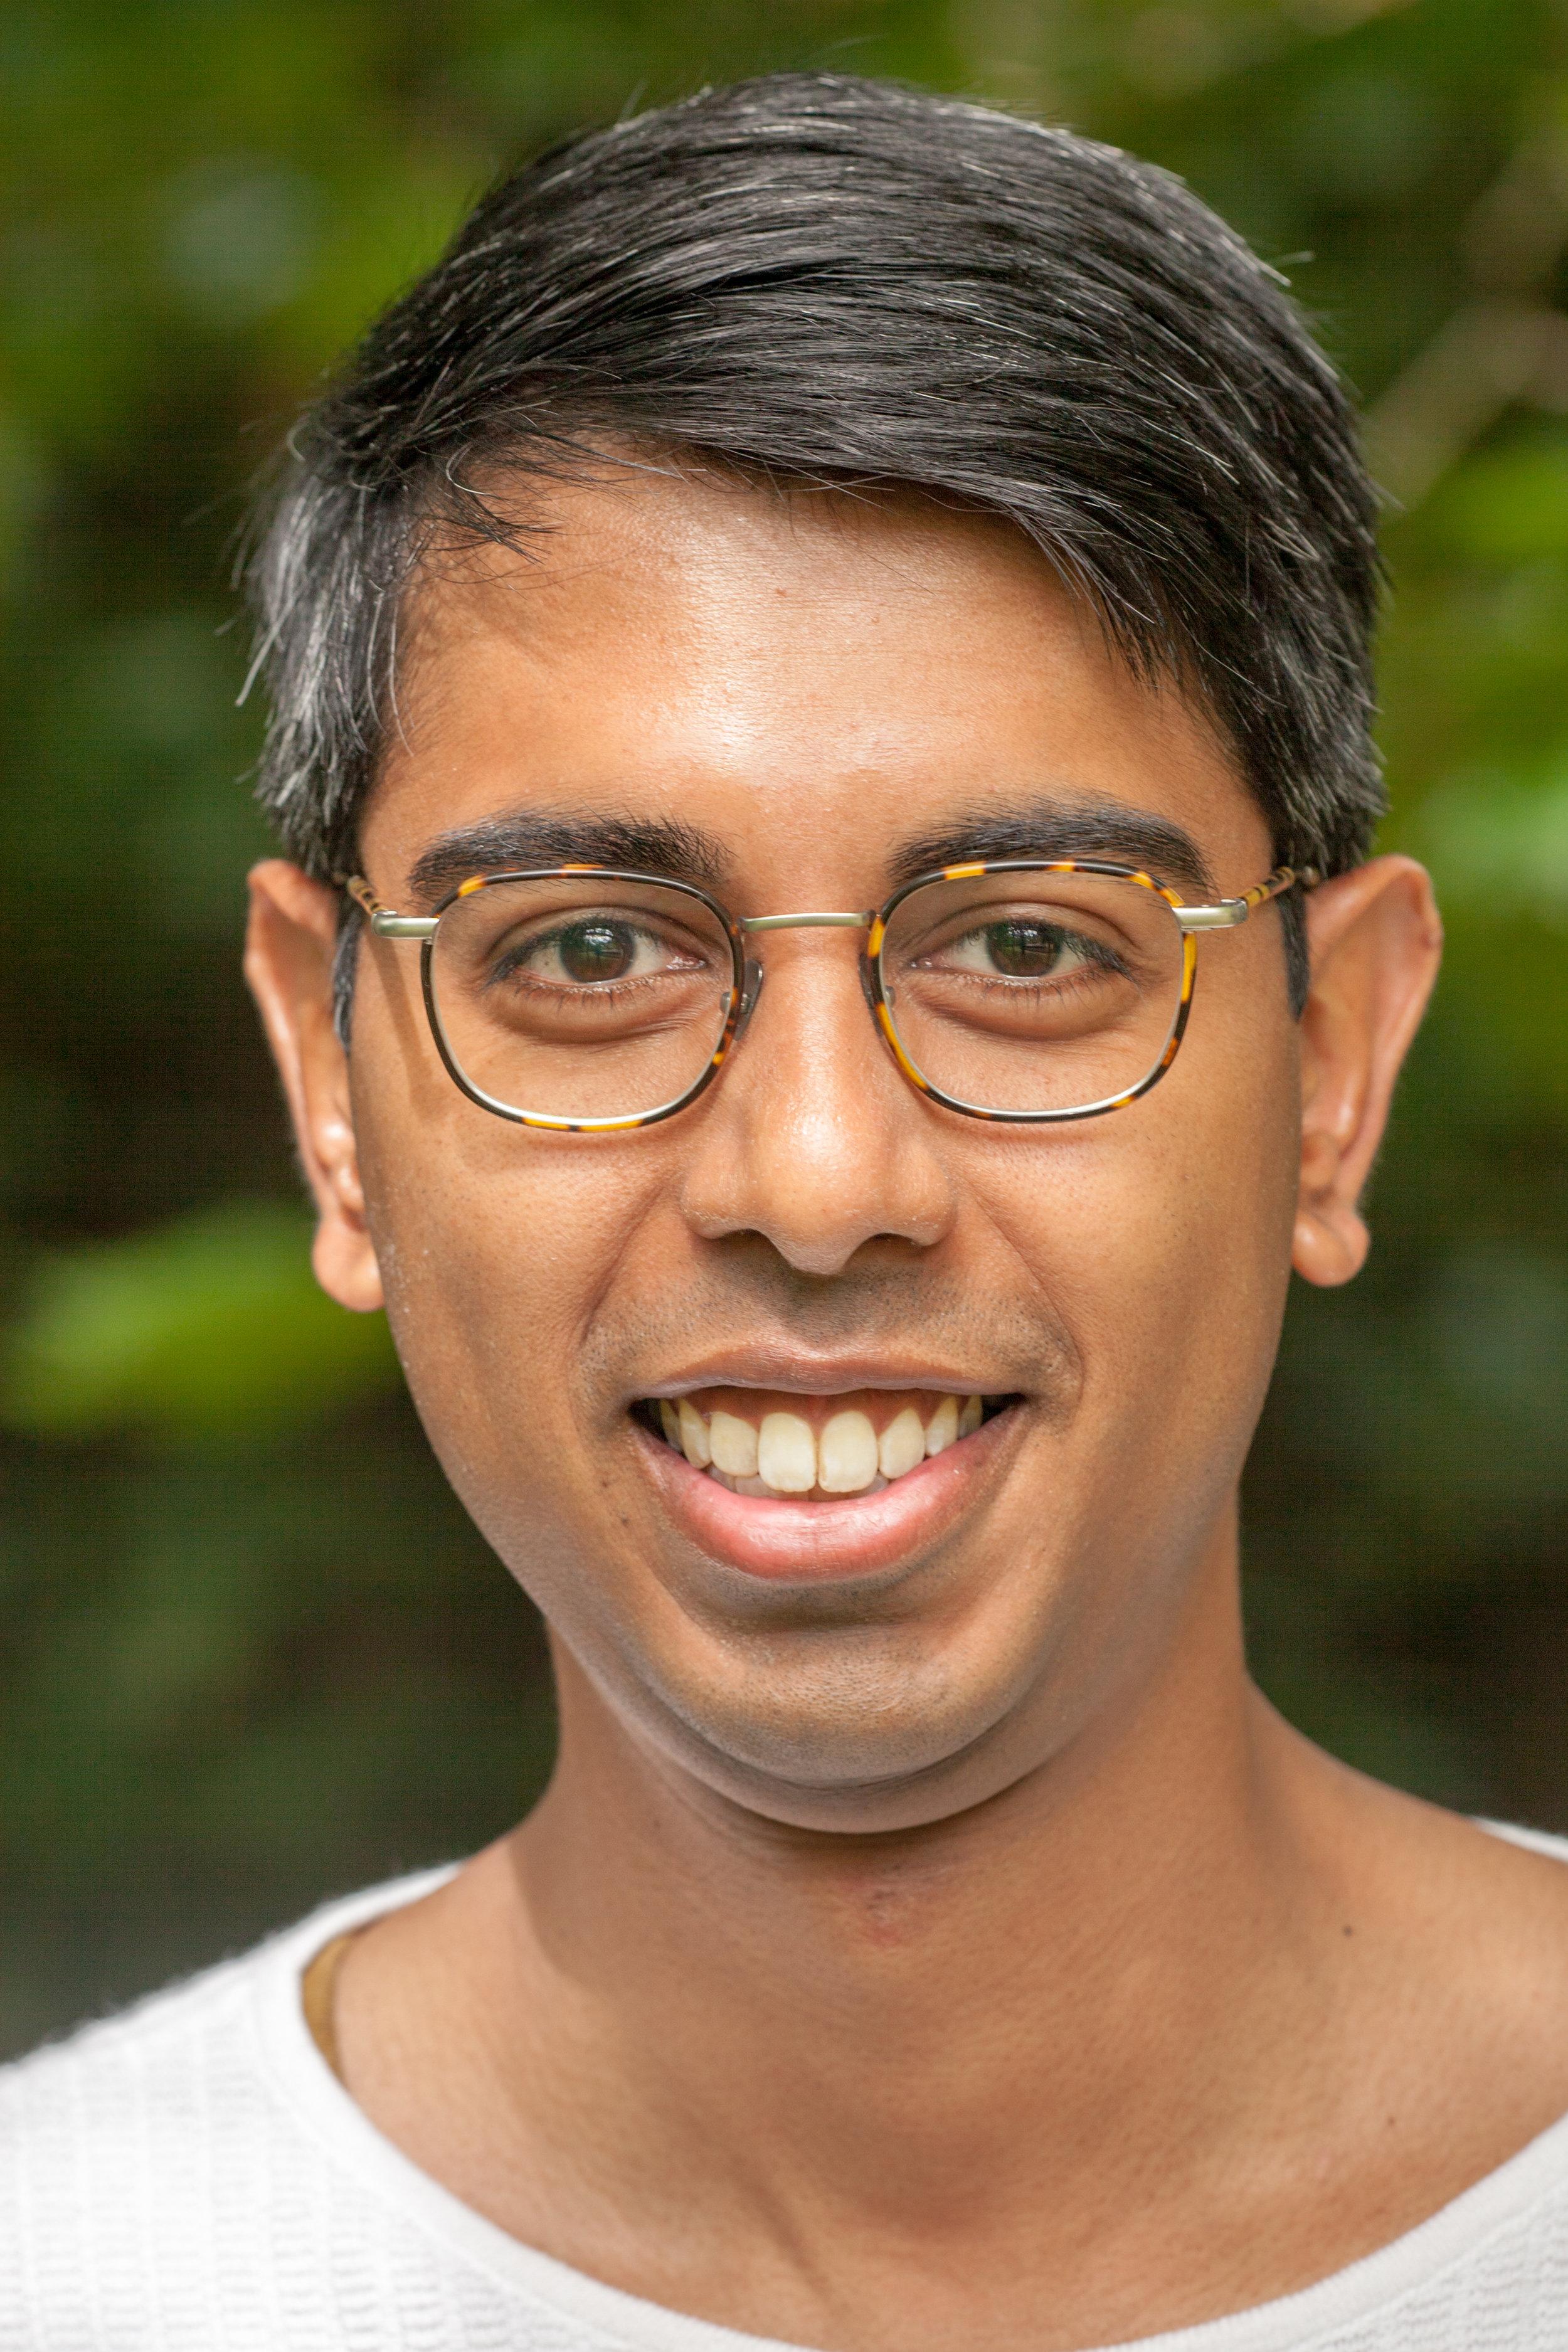 Navin Ramakrishna - Wellcome Trust 4yr PhD Programme - Developmental Mechanisms and A*STAR Singapore ScholarMBiochem 2014 University of Oxfordnr384@cam.ac.uk@NavinBrian